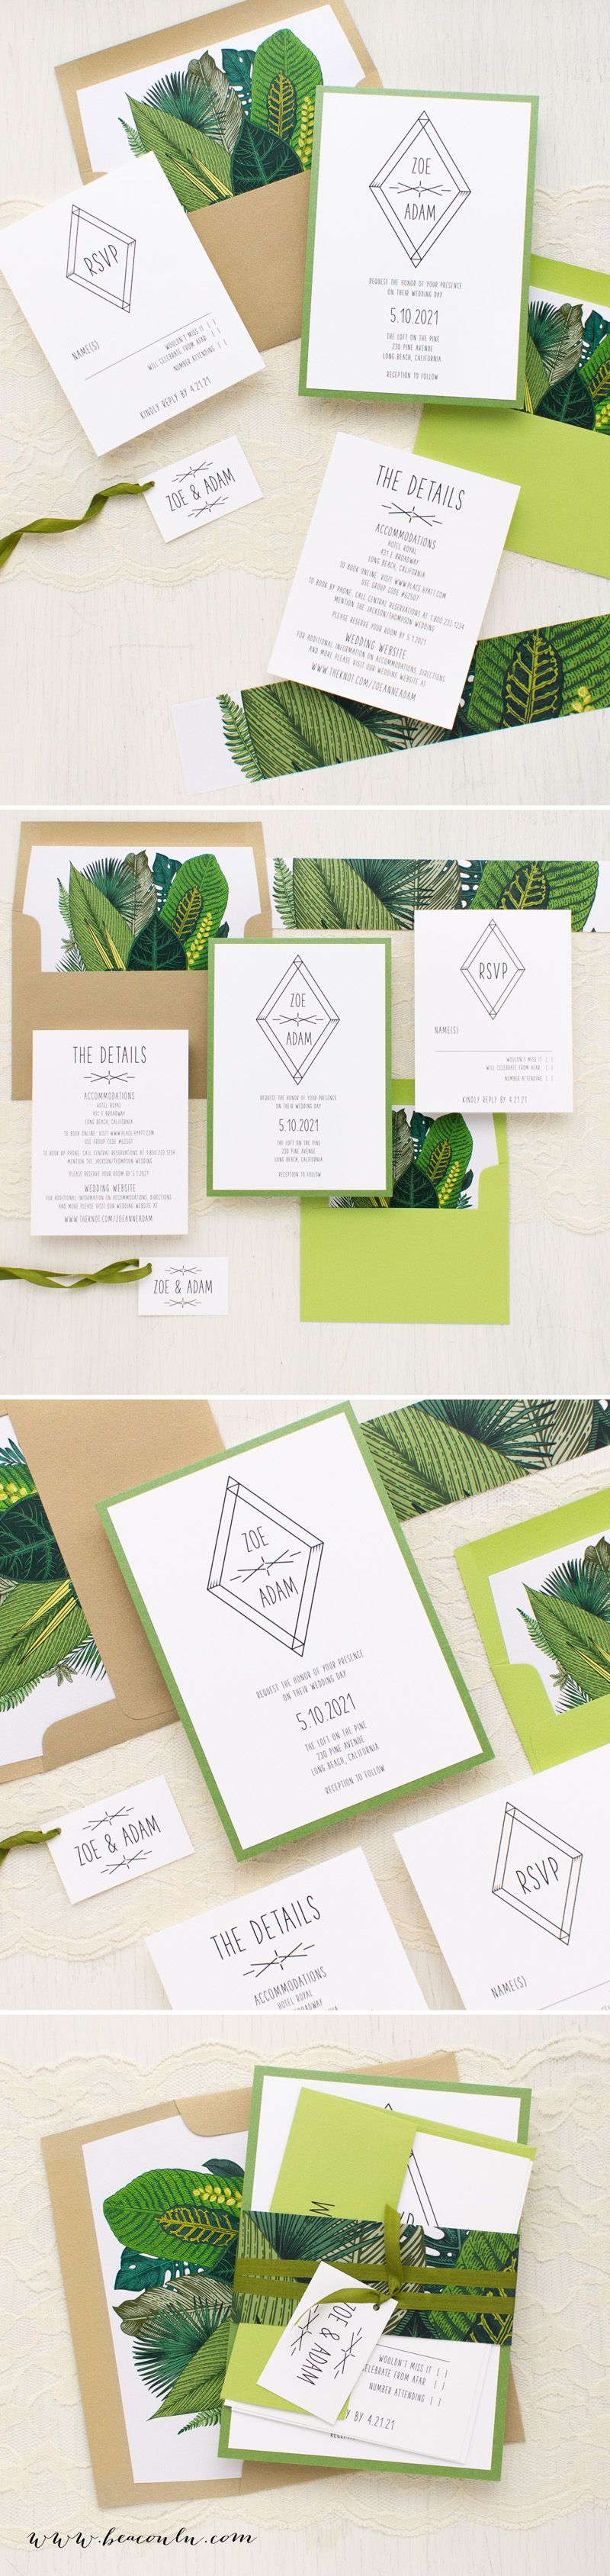 Green Leaf Wedding Invitations Wedding Invitations Pinterest